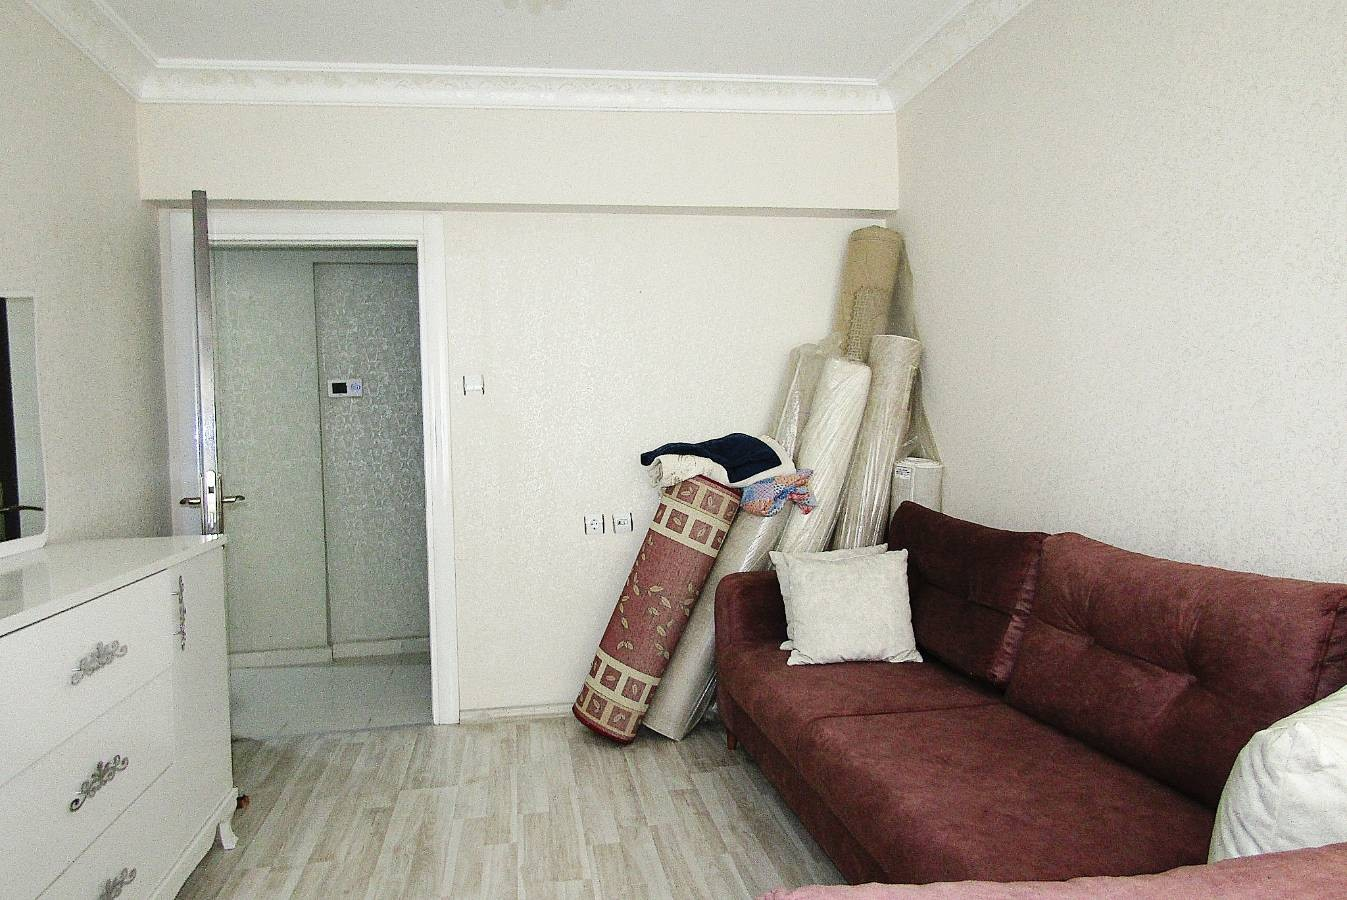 SR EMLAK'TAN TOPÇU MAH'DE 3+1 110m² CADDE ÜZERİNDE YAPILI DAİRE